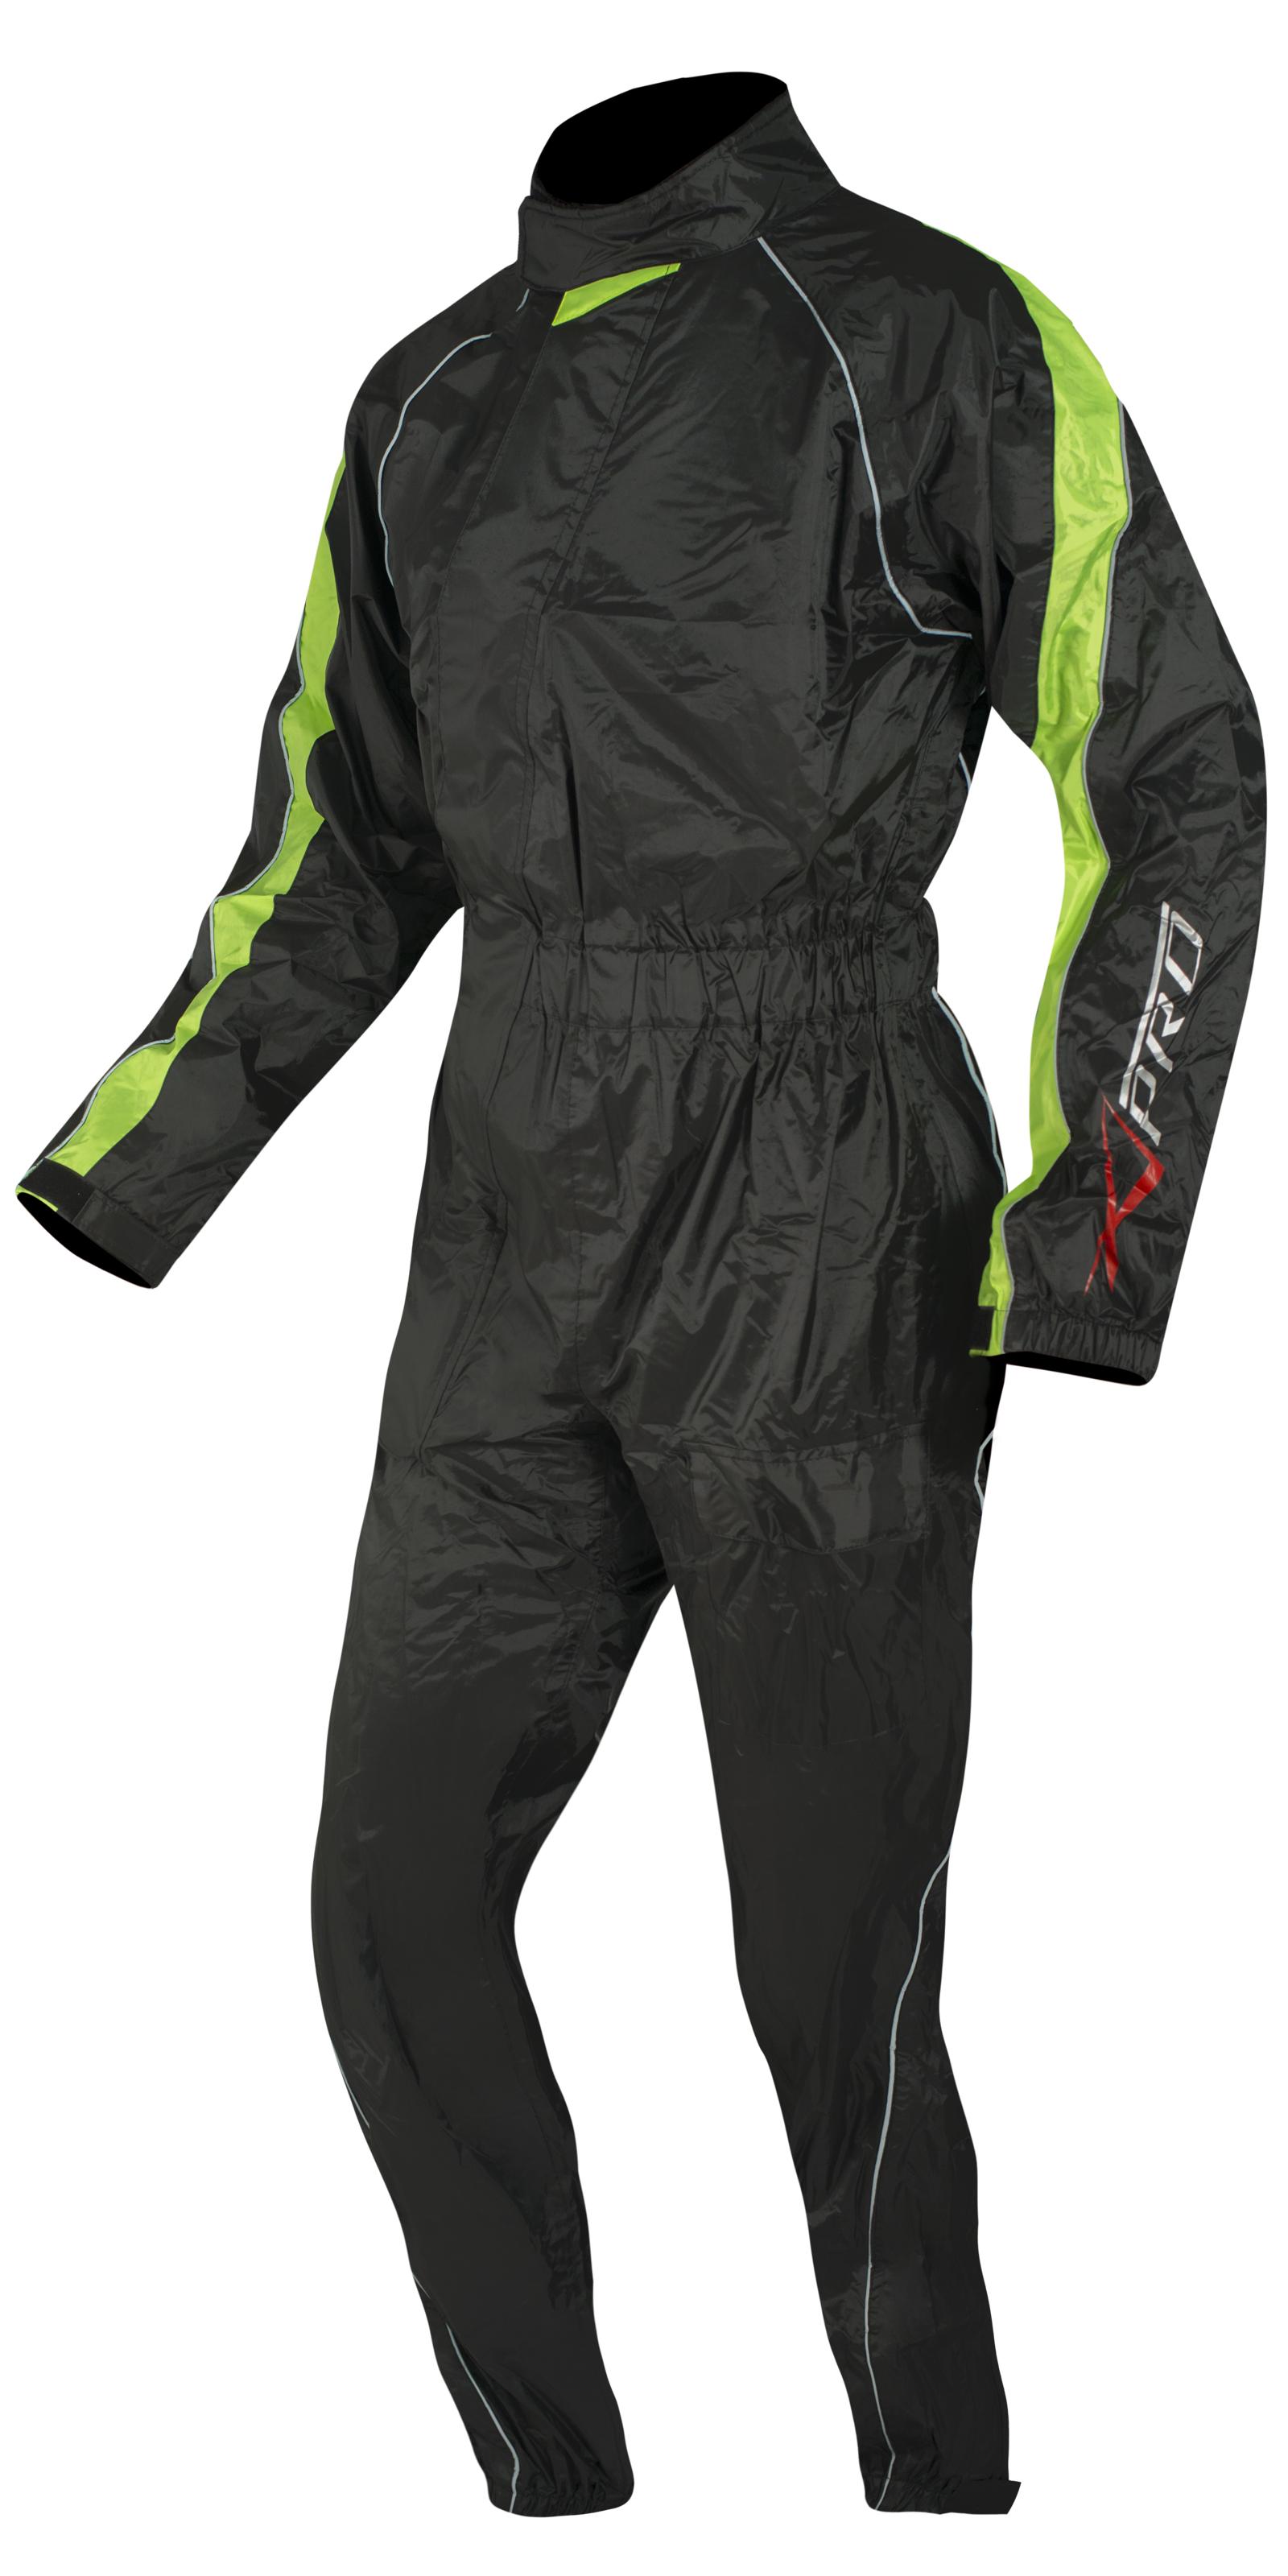 Tuta-100-Impermeabile-Completo-Anti-Pioggia-Moto-Scooter-Antiacqua-Unisex miniatura 7